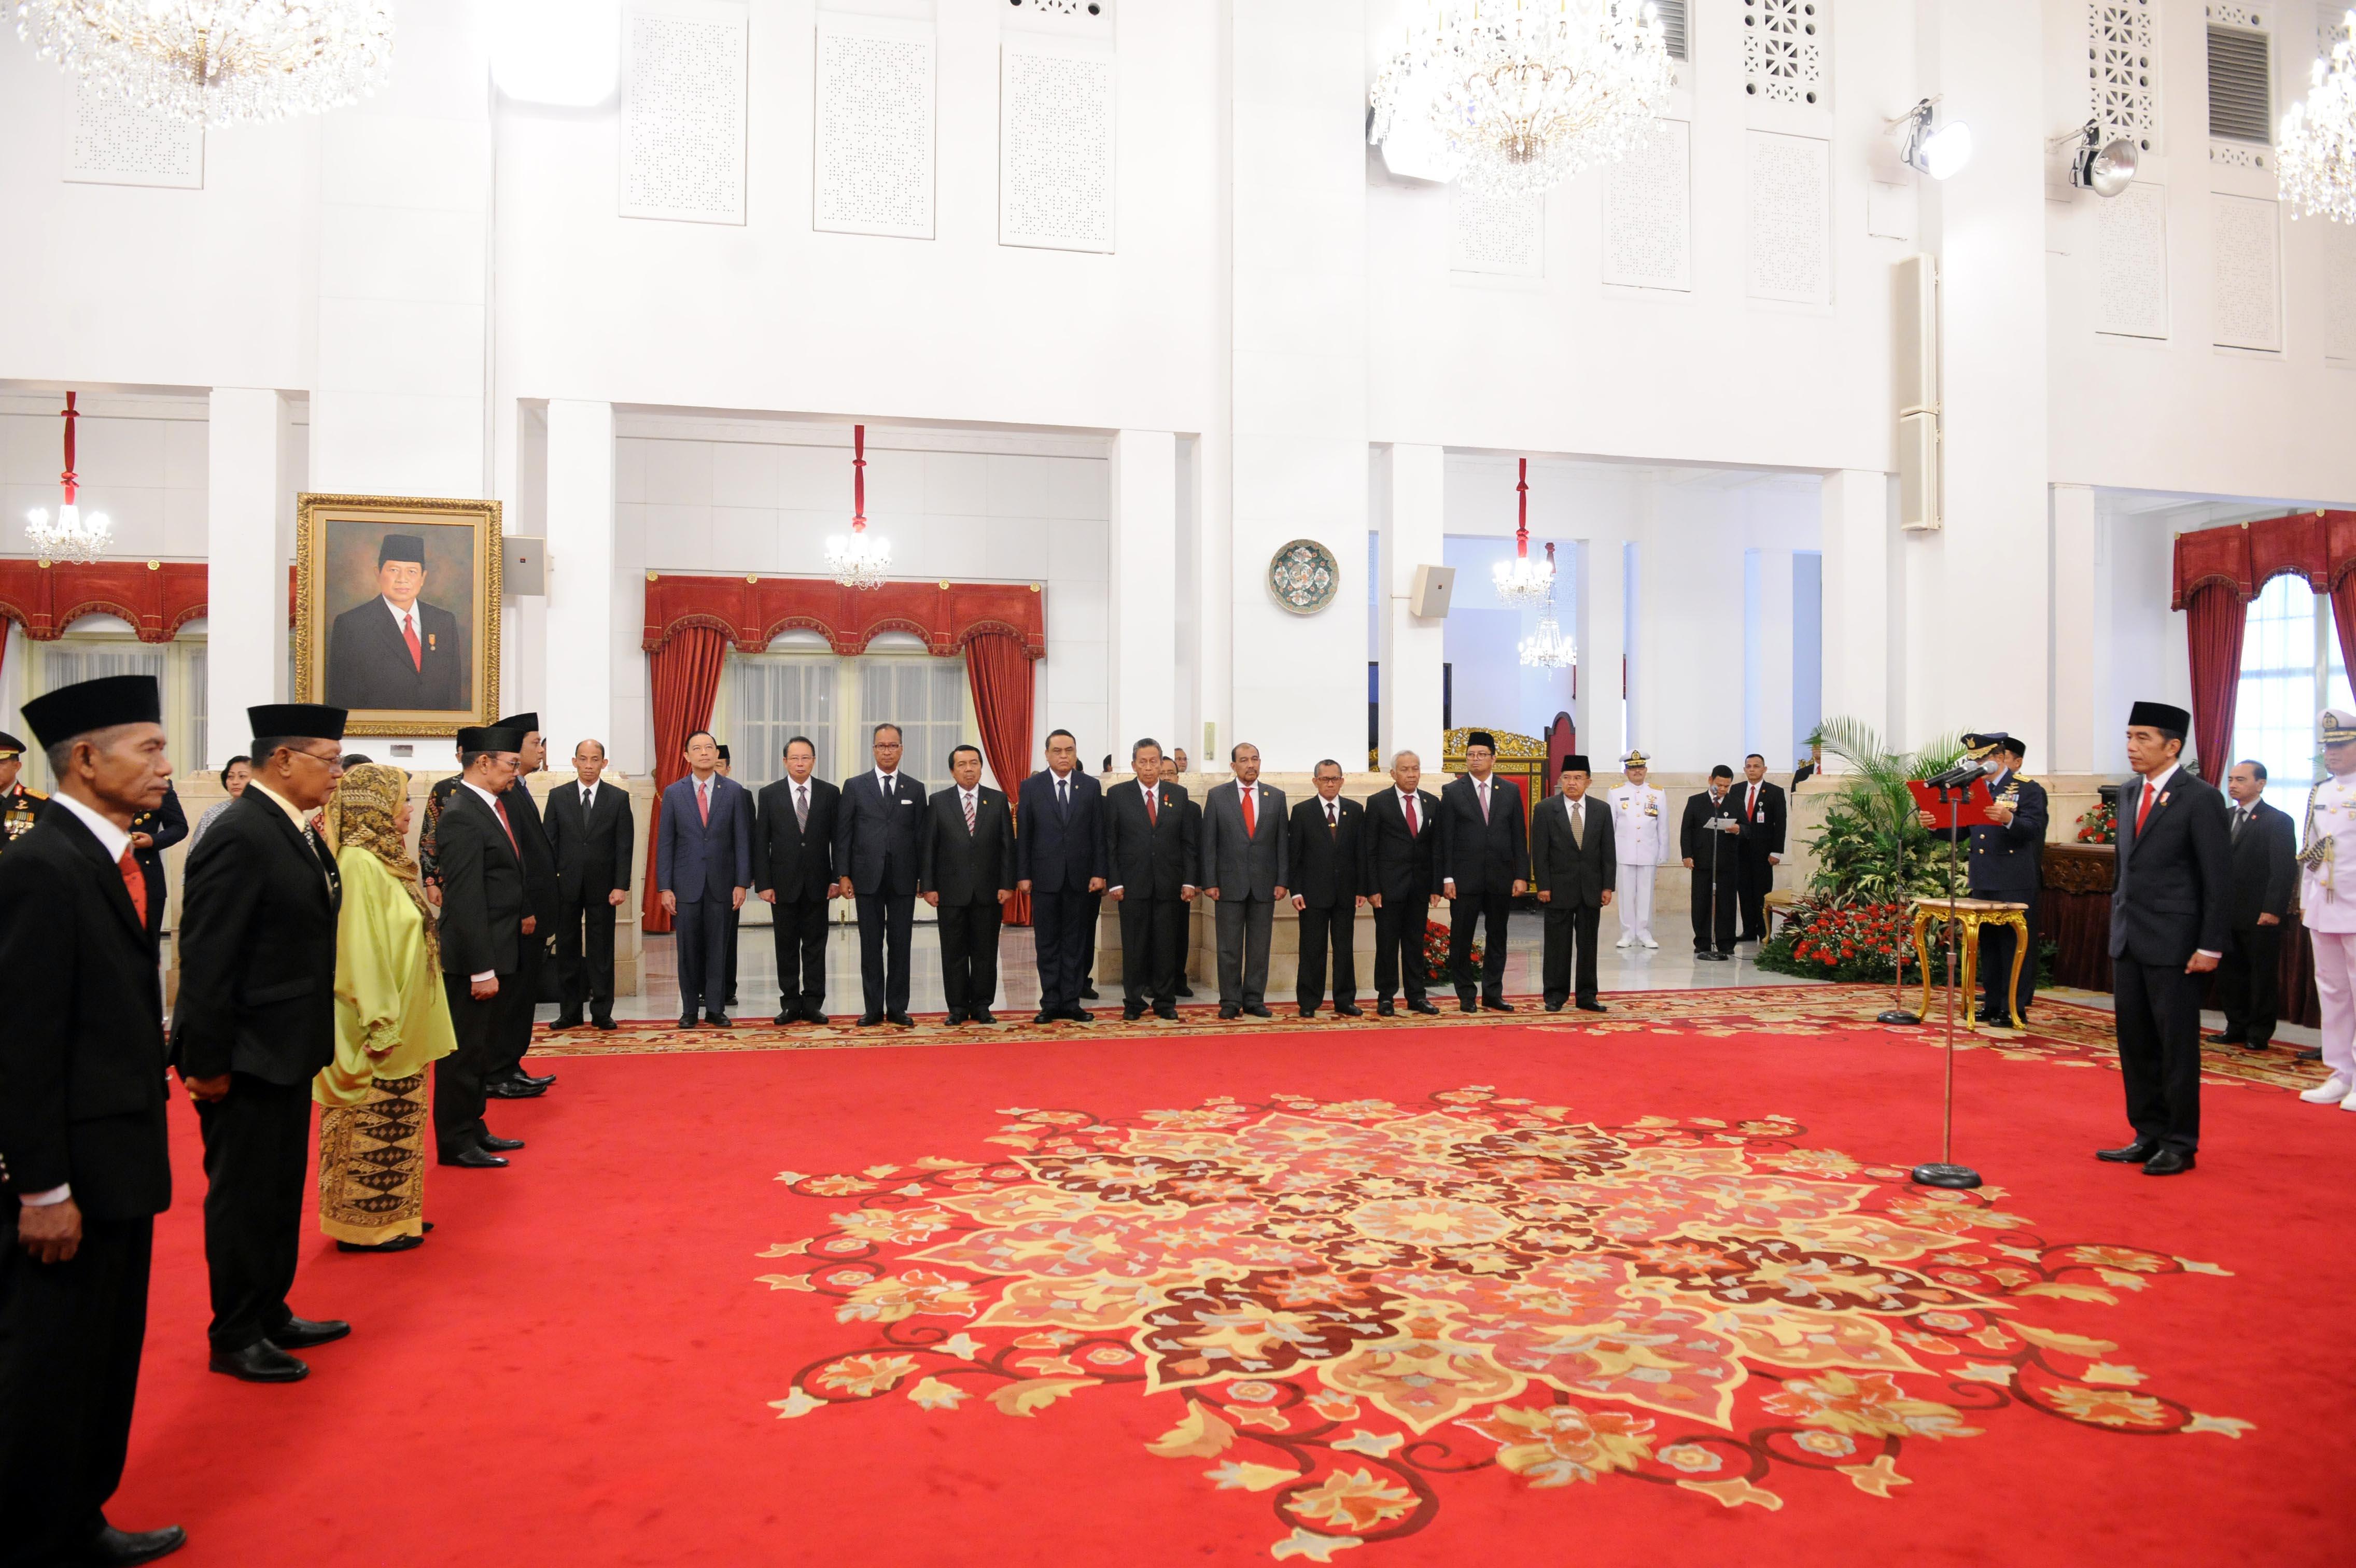 Presiden Jokowi Beri Gelar Pahlawan Nasional ke 6 Tokoh Indonesia